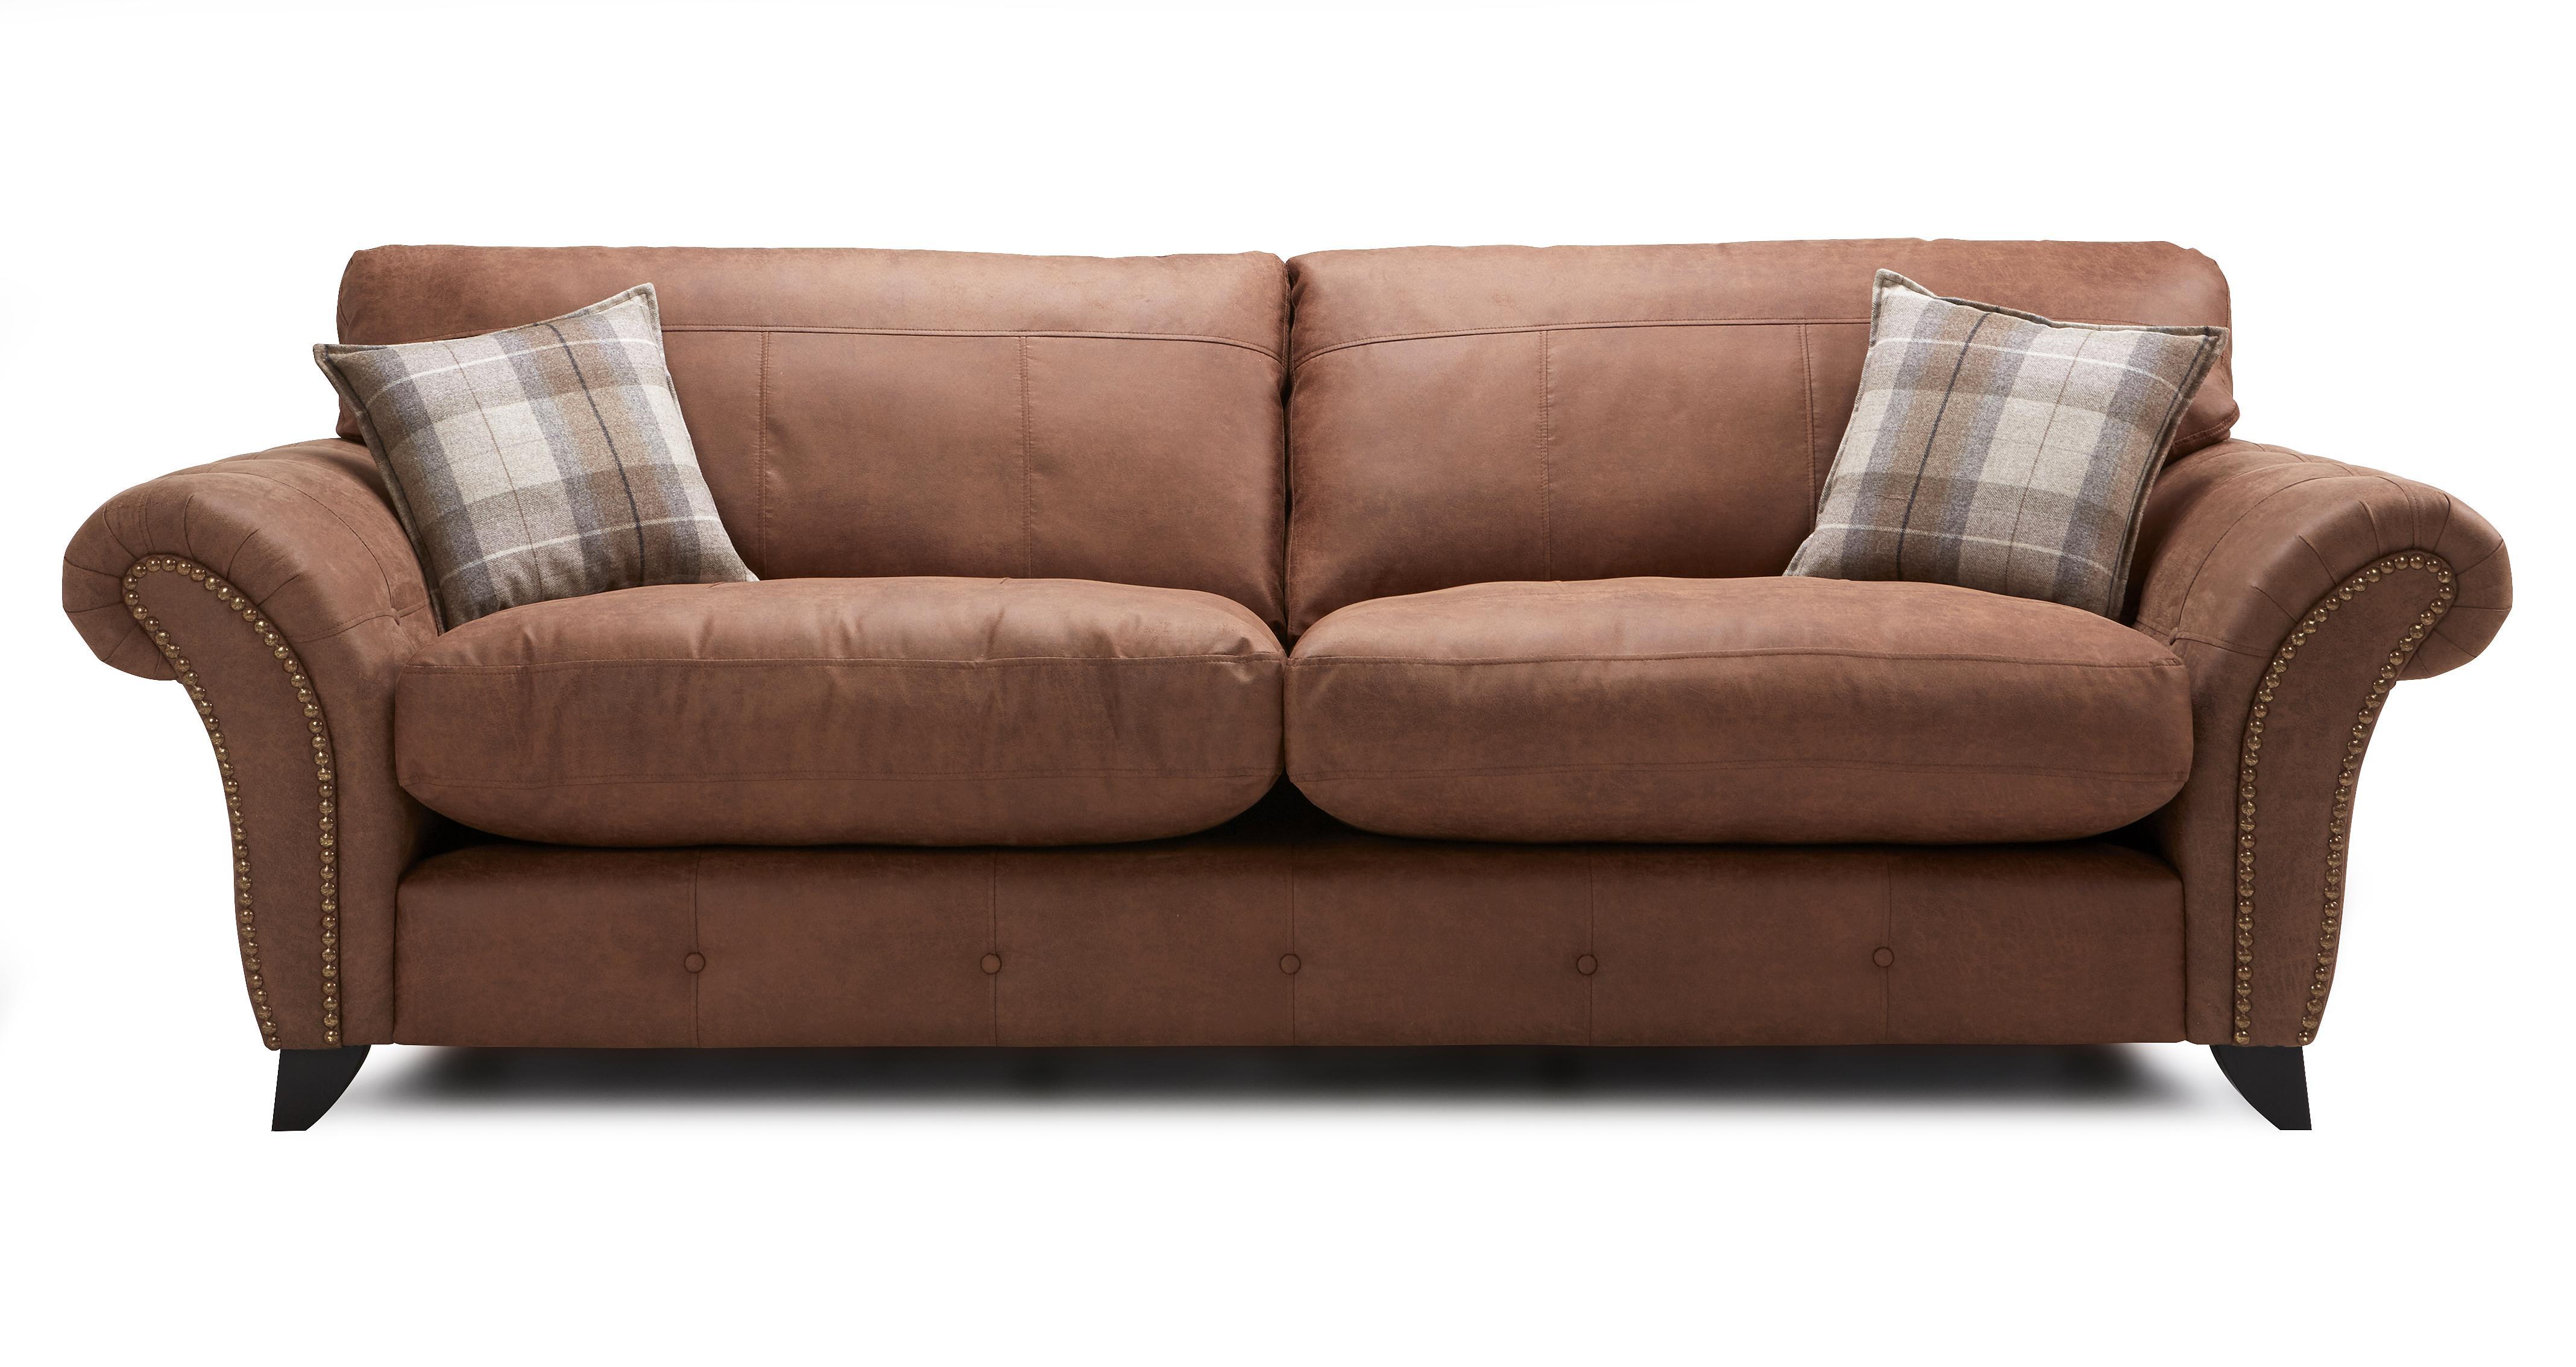 Fallon Left Hand Facing 3 Seater Formal Back Corner Sofa Oakland